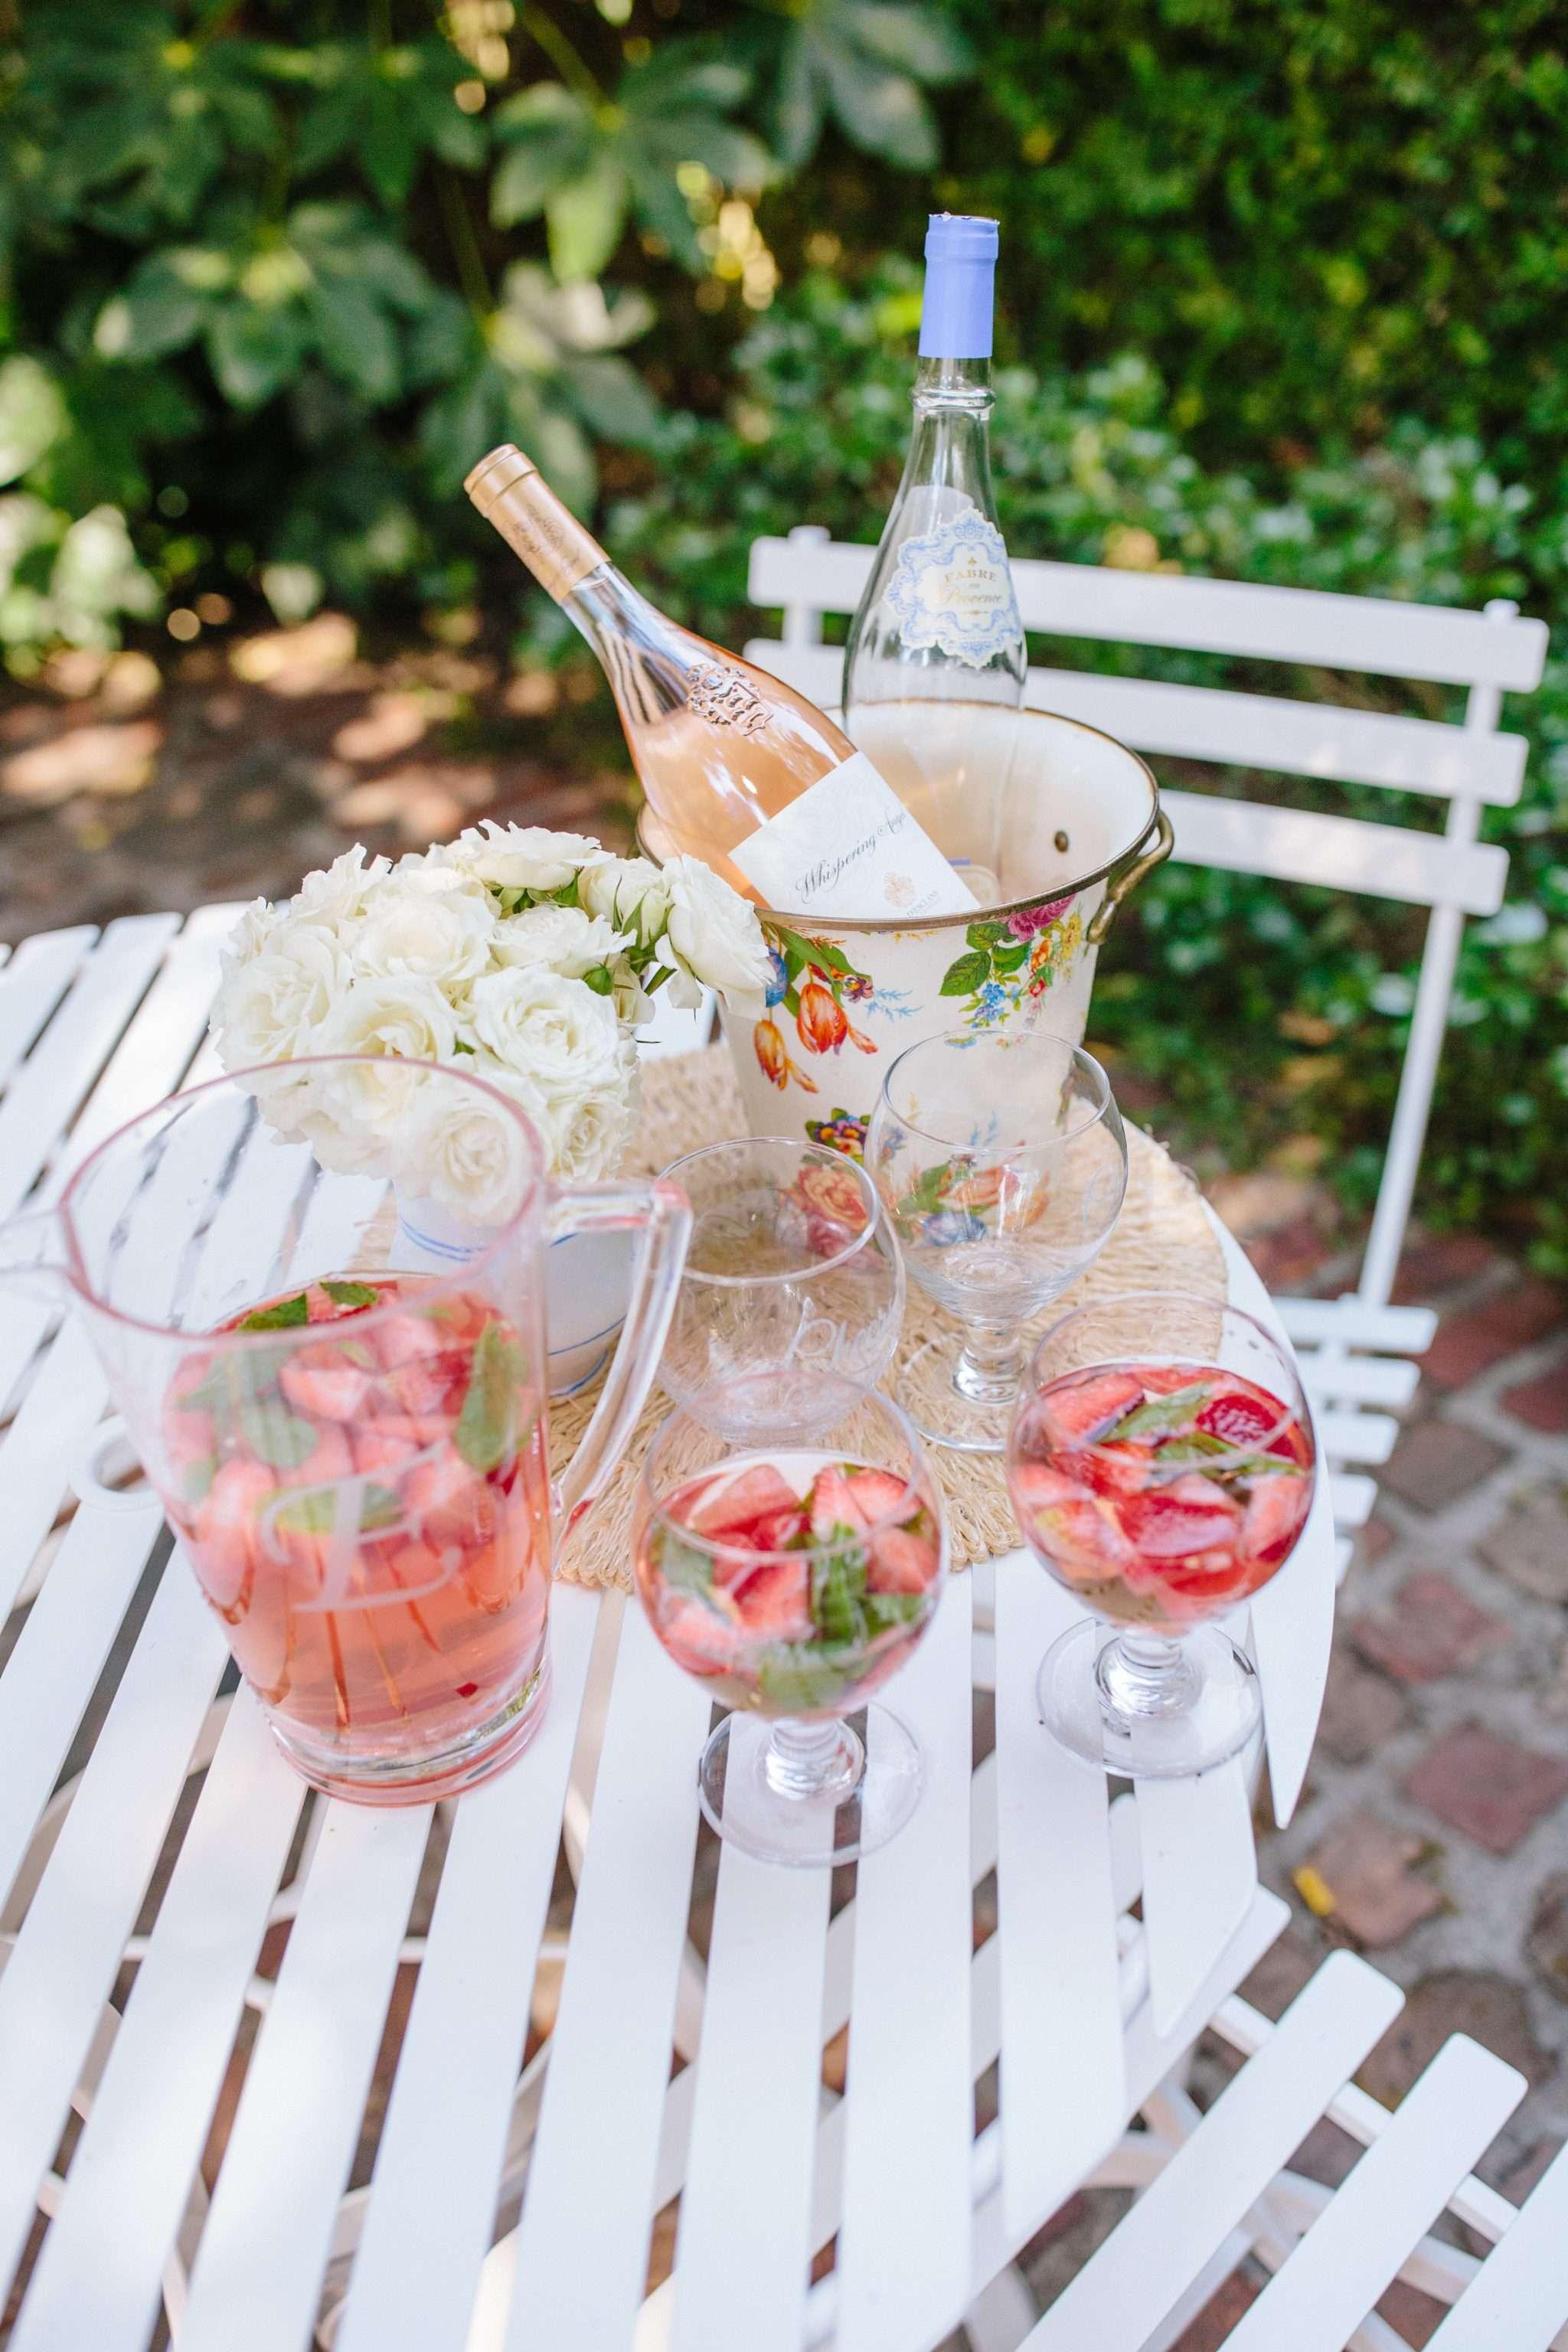 How to throw an al fresco summer sangria party // Rhyme & Reason